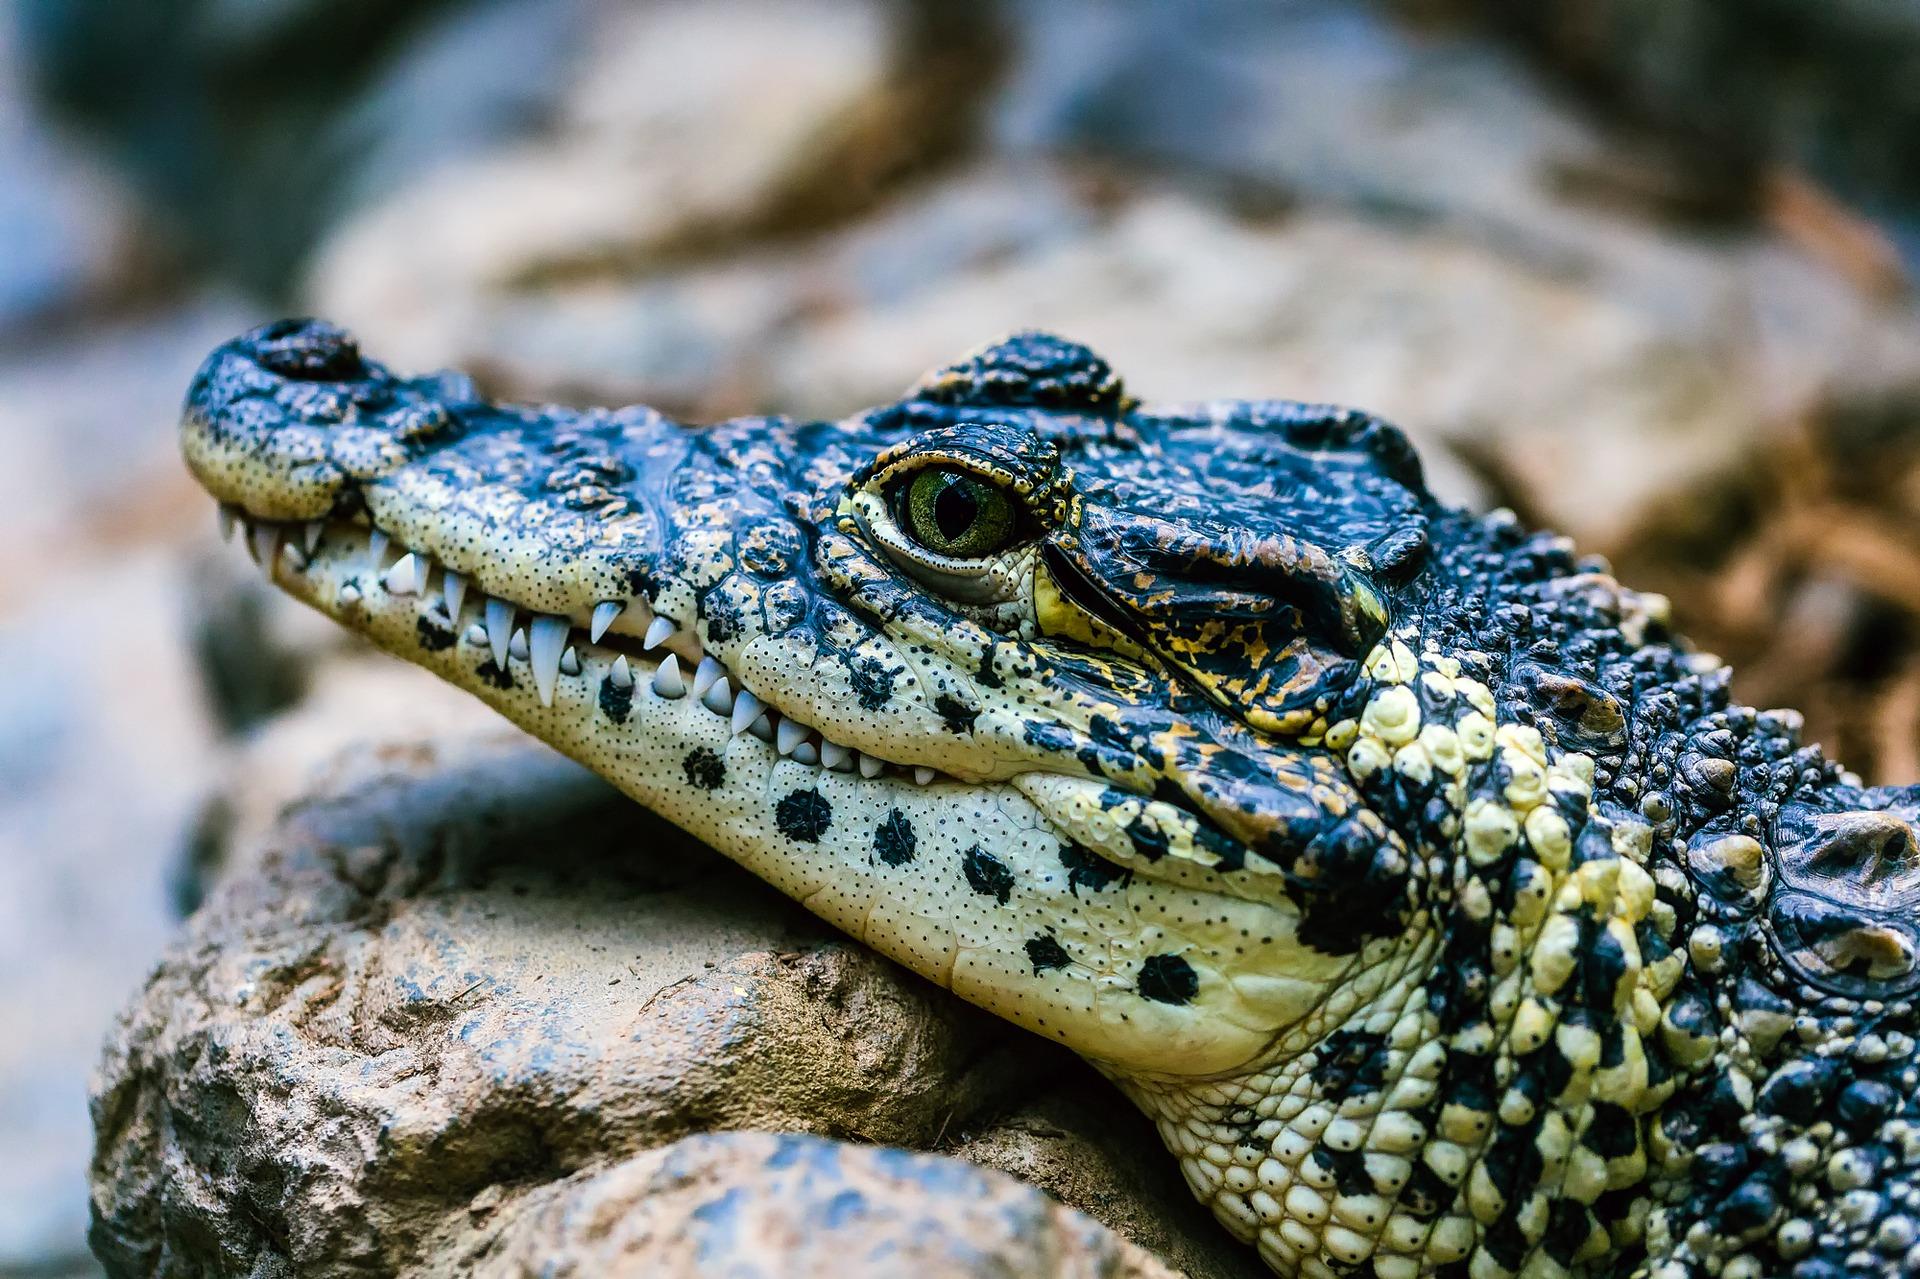 Alligator - alligator